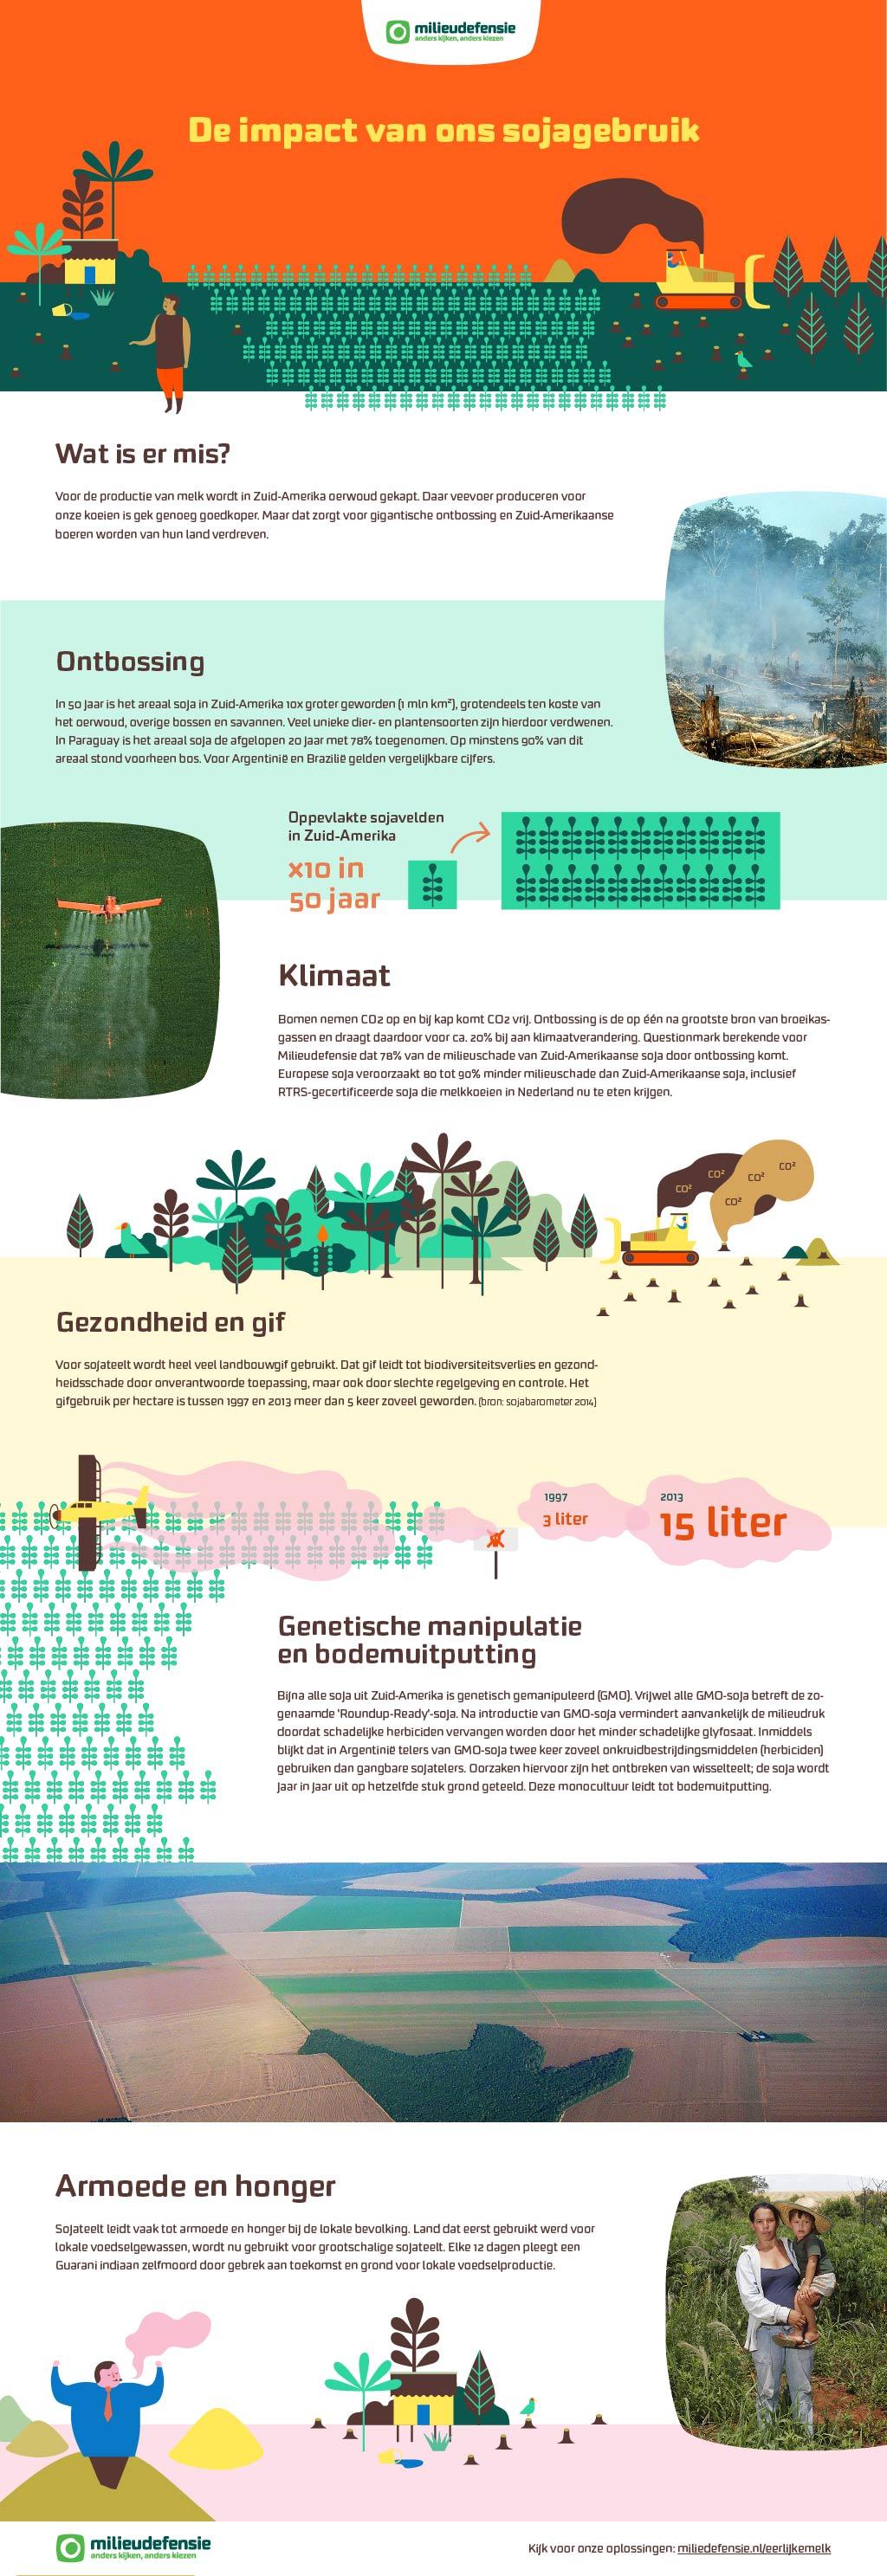 Milieudefensie-infographic-melk-act-impact-01